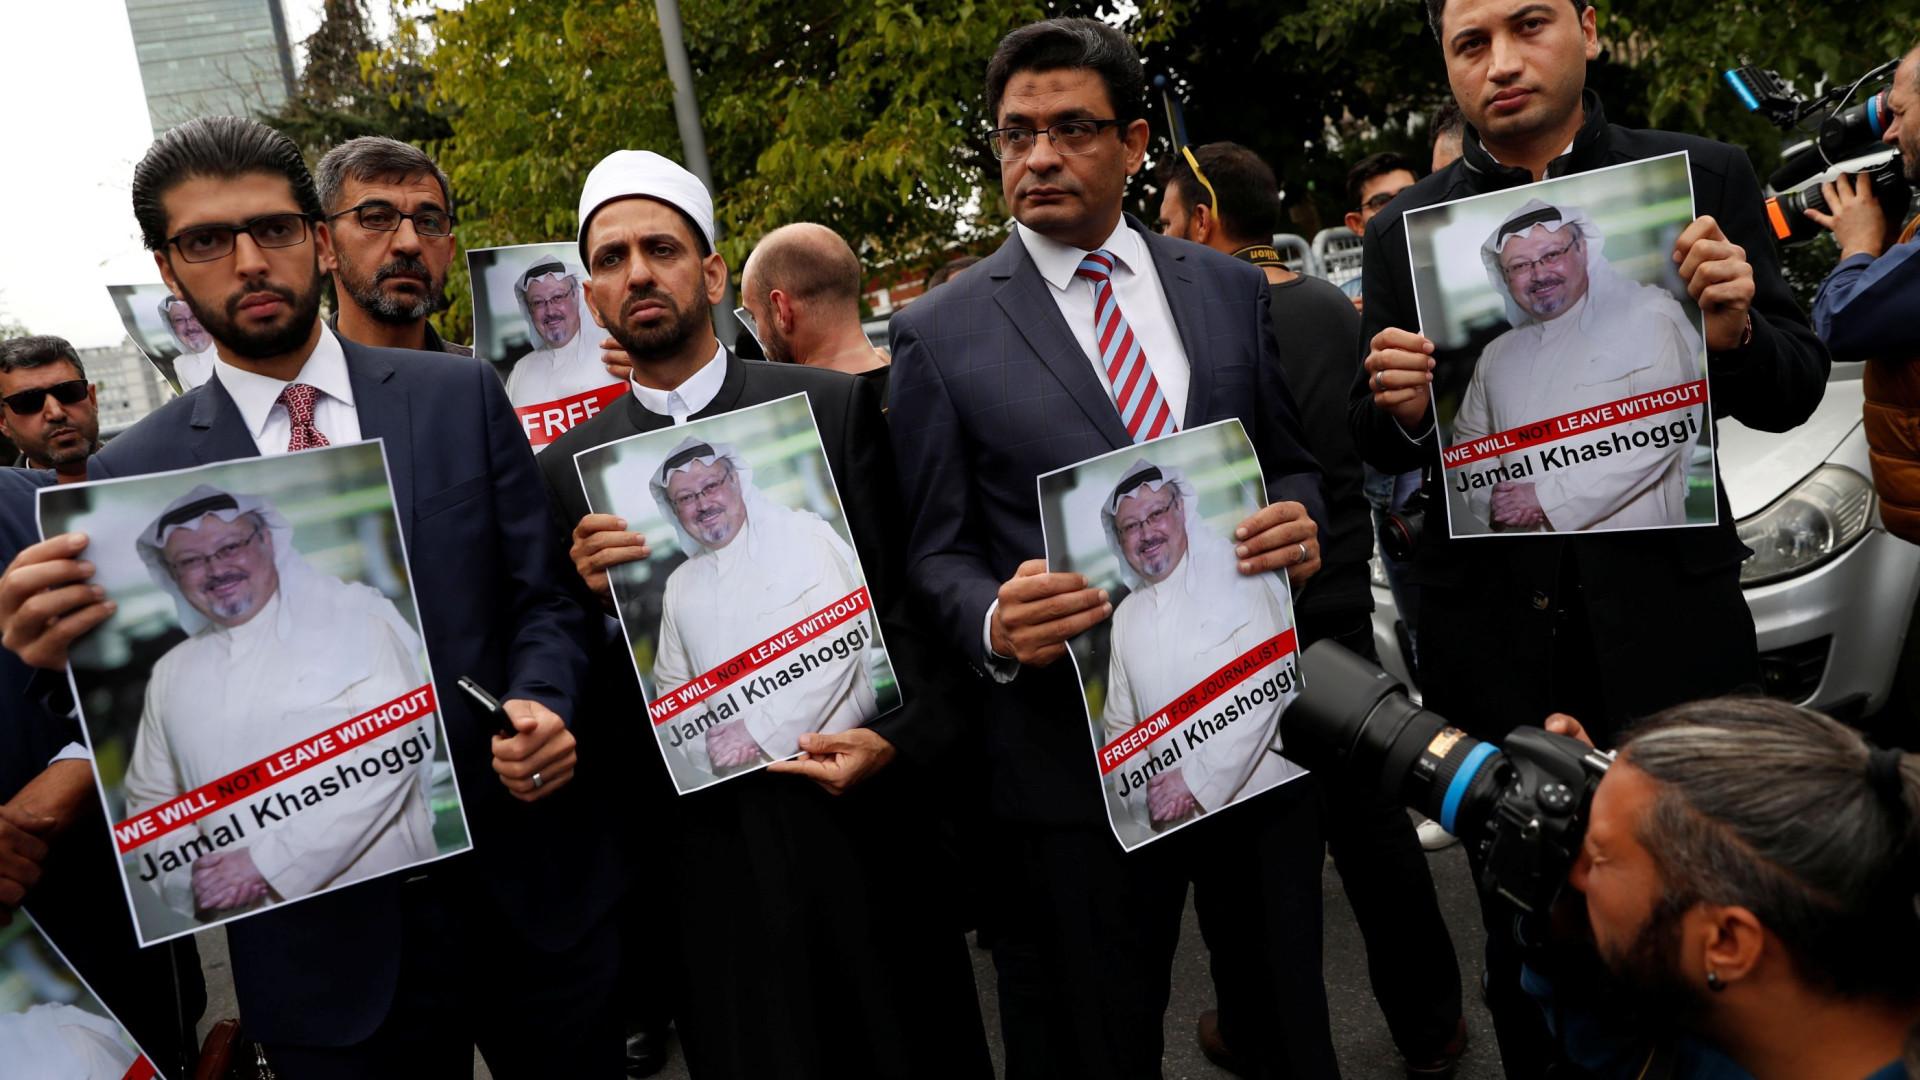 Apple Watch de jornalista saudita teria registros de tortura e morte